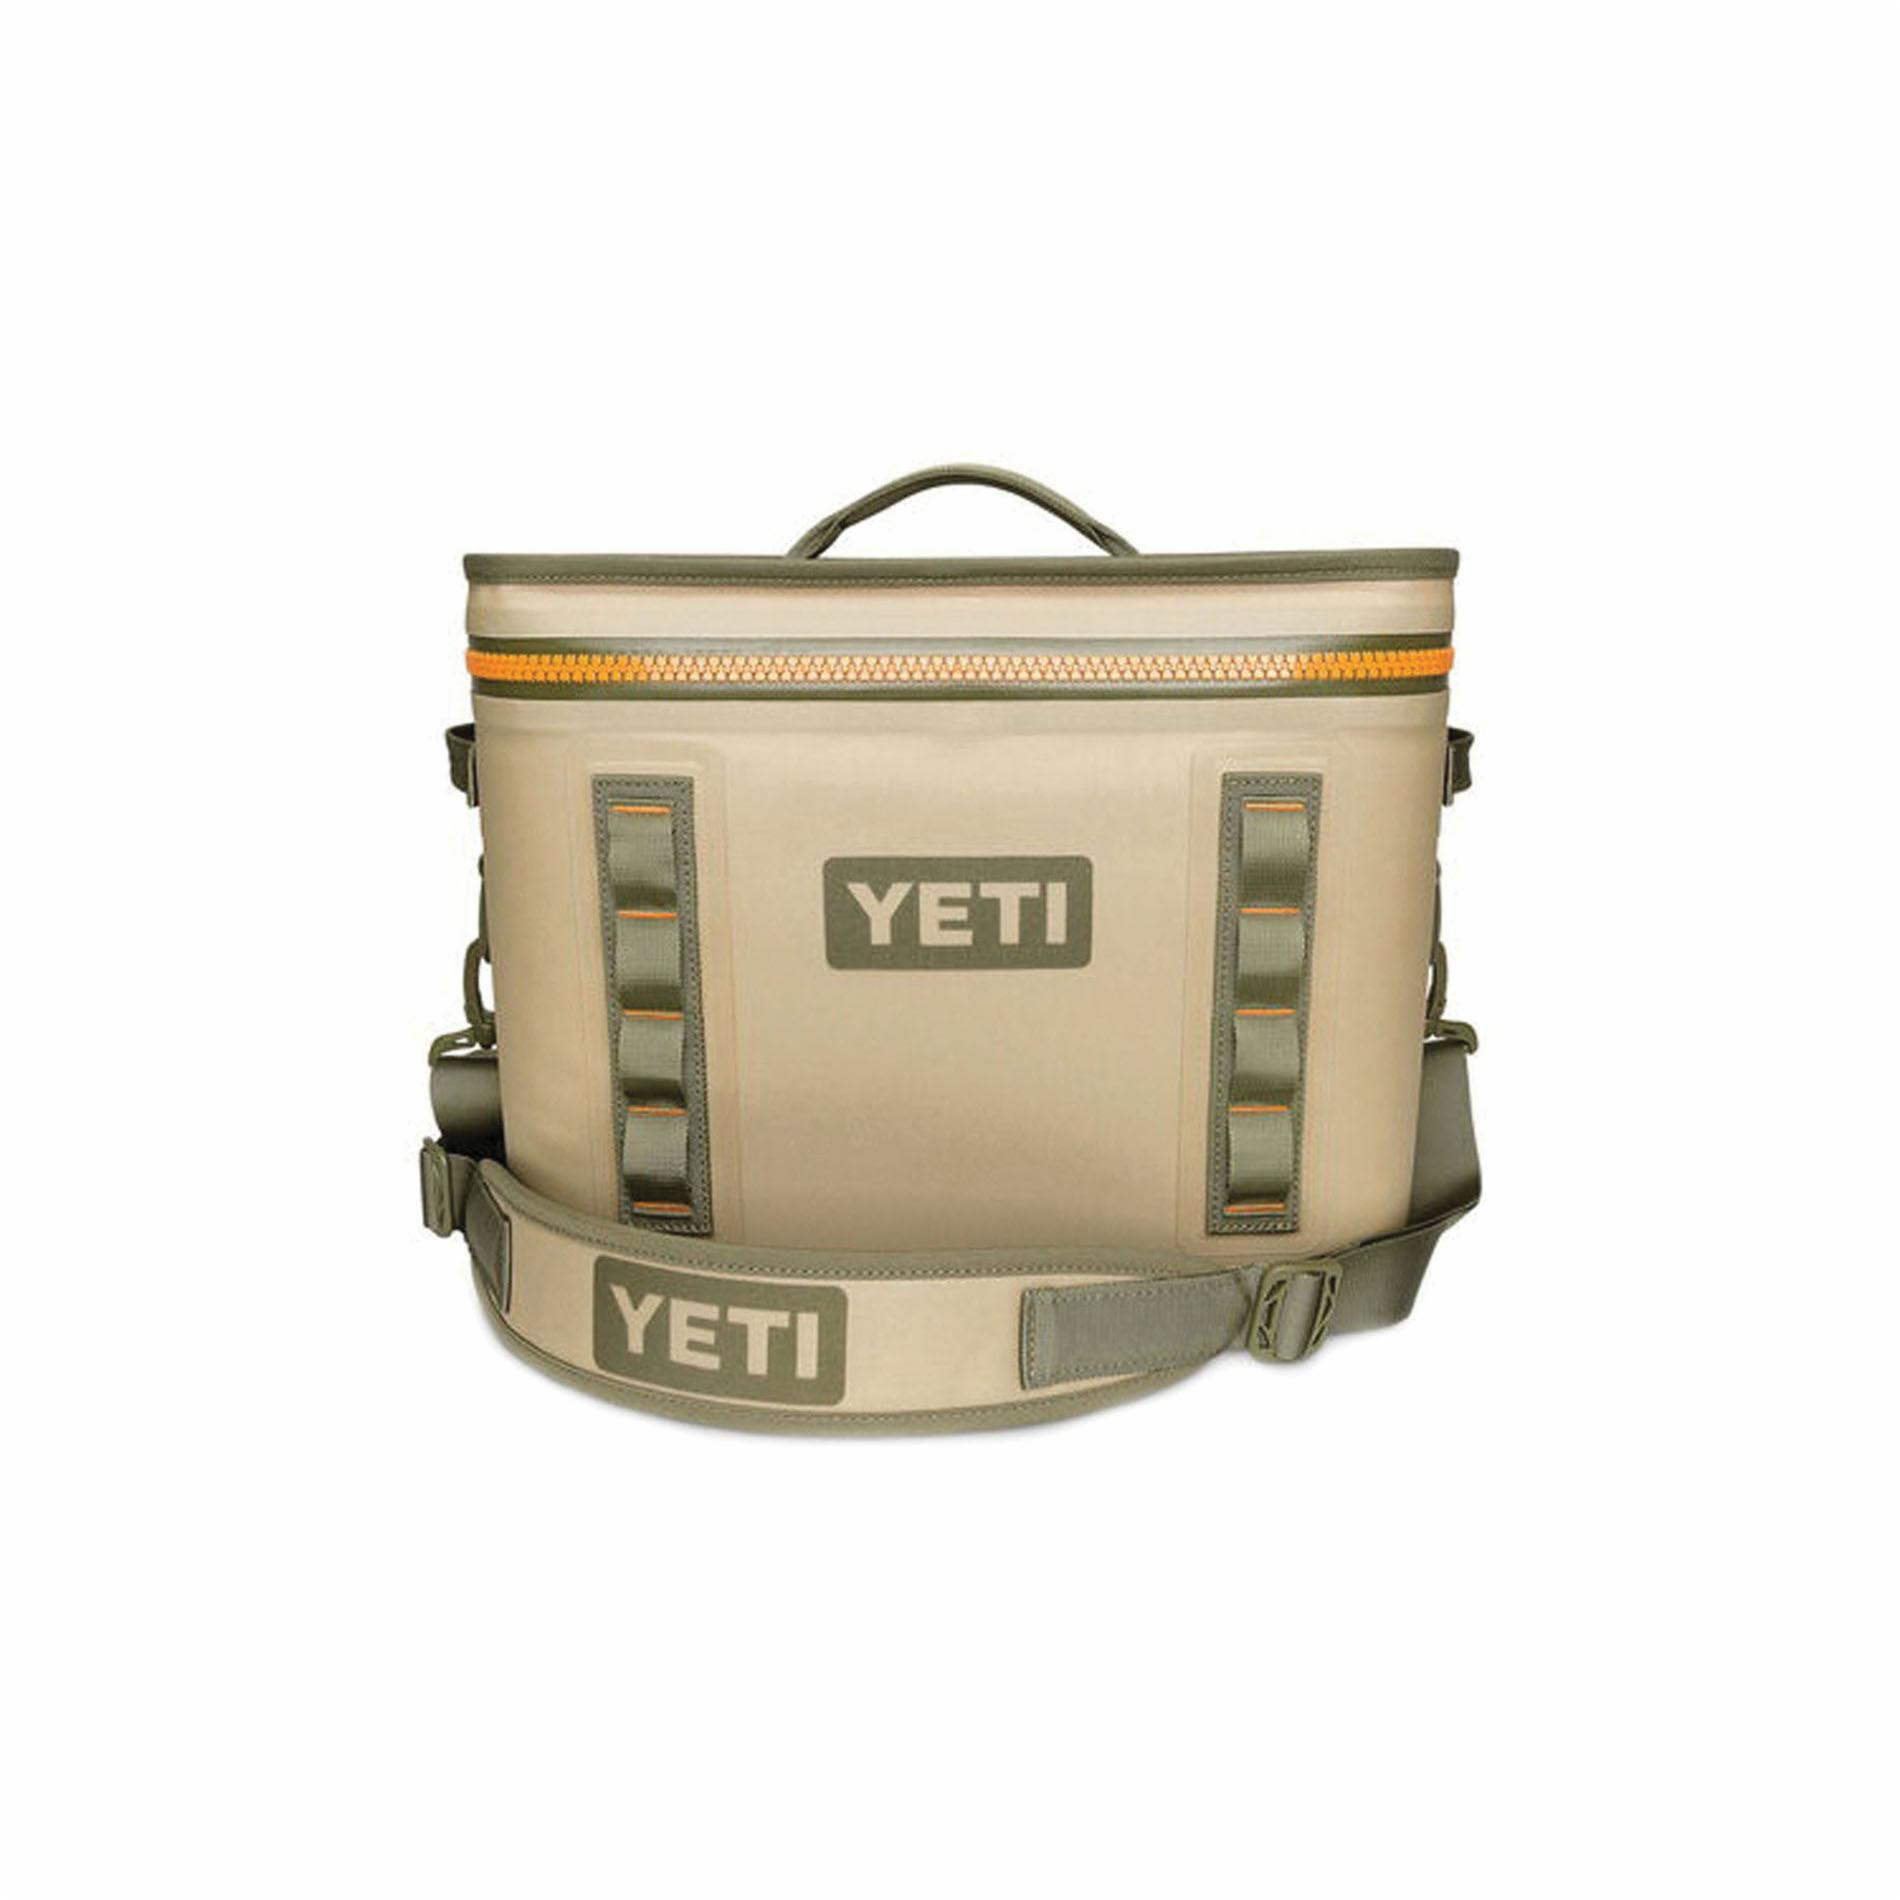 Picture of YETI Hopper Flip YHOPF18T Soft Bag Cooler, 20 Cans Capacity, Blaze Orange/Field Tan